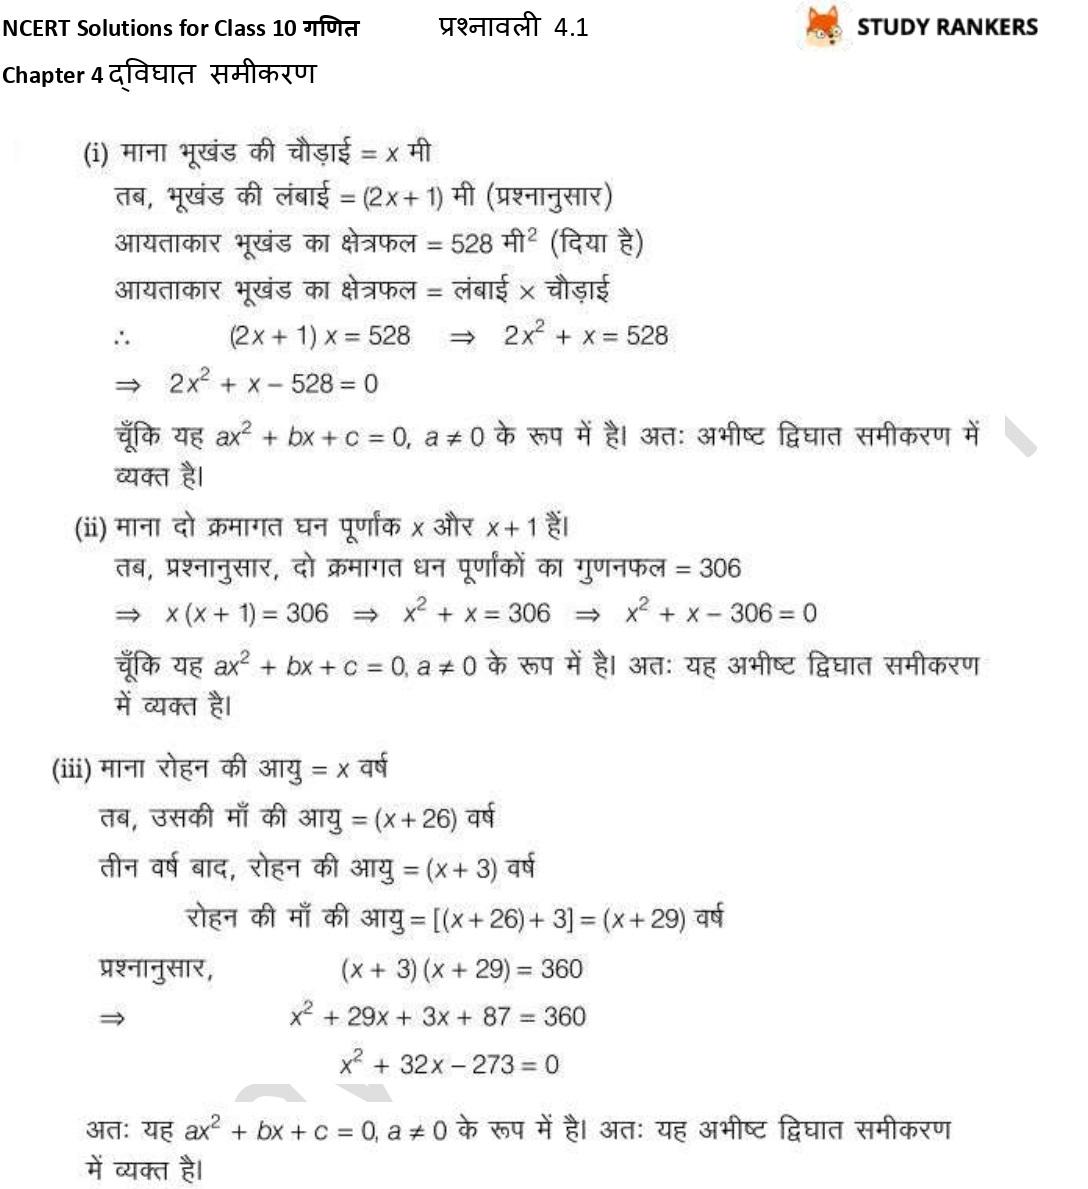 NCERT Solutions for Class 10 Maths Chapter 4 द्विघात समीकरण प्रश्नावली 4.1 Part 4